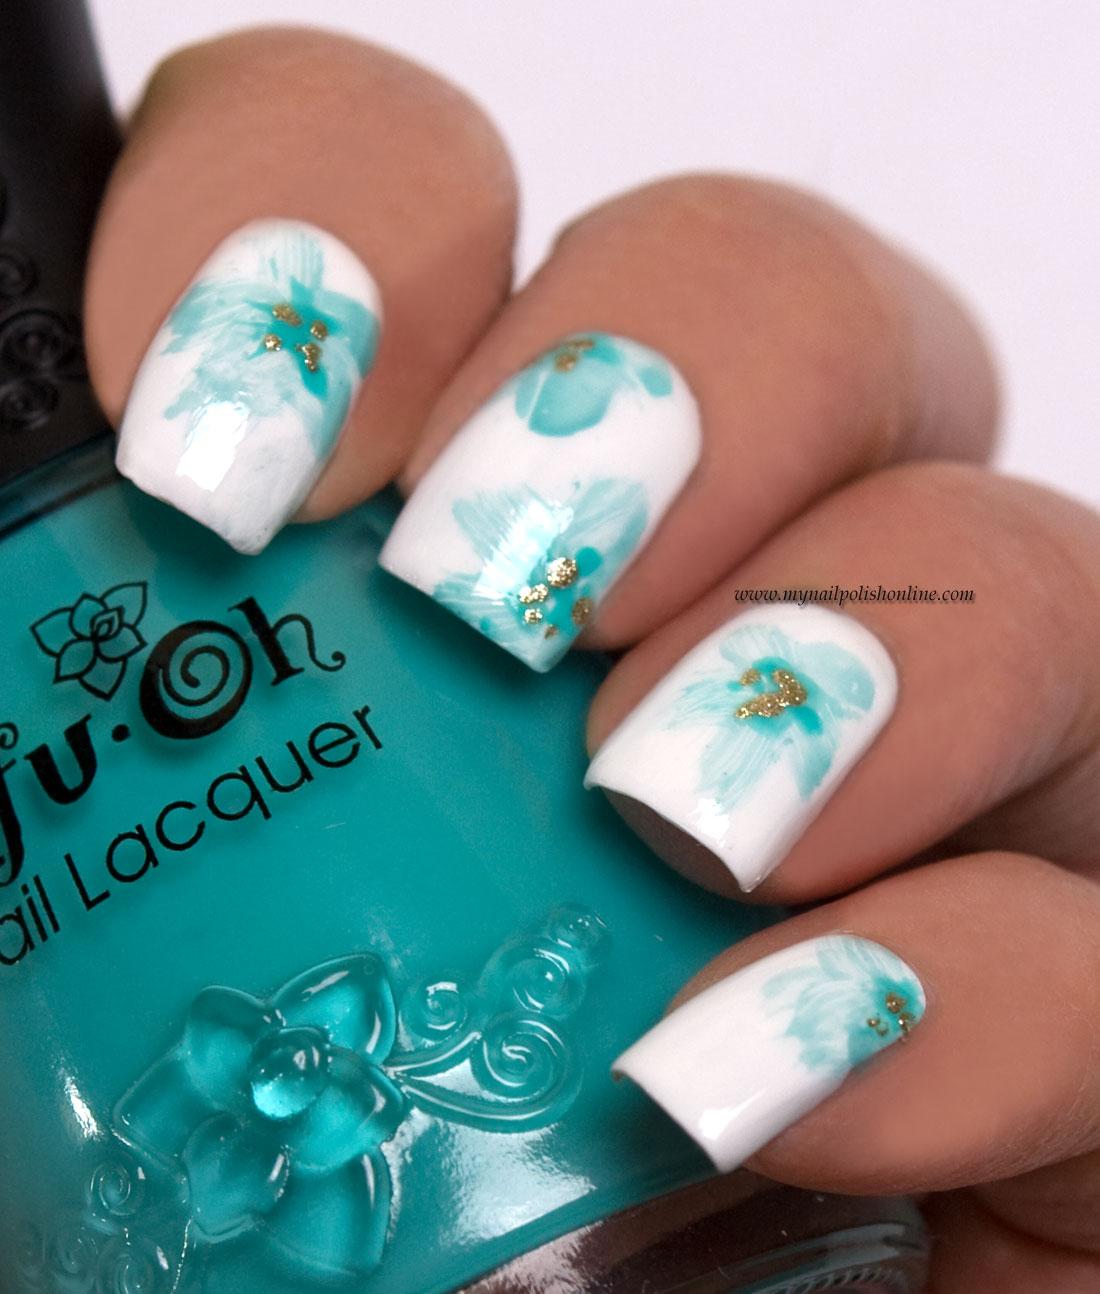 Floral Manicure Using The Watercolor Technique